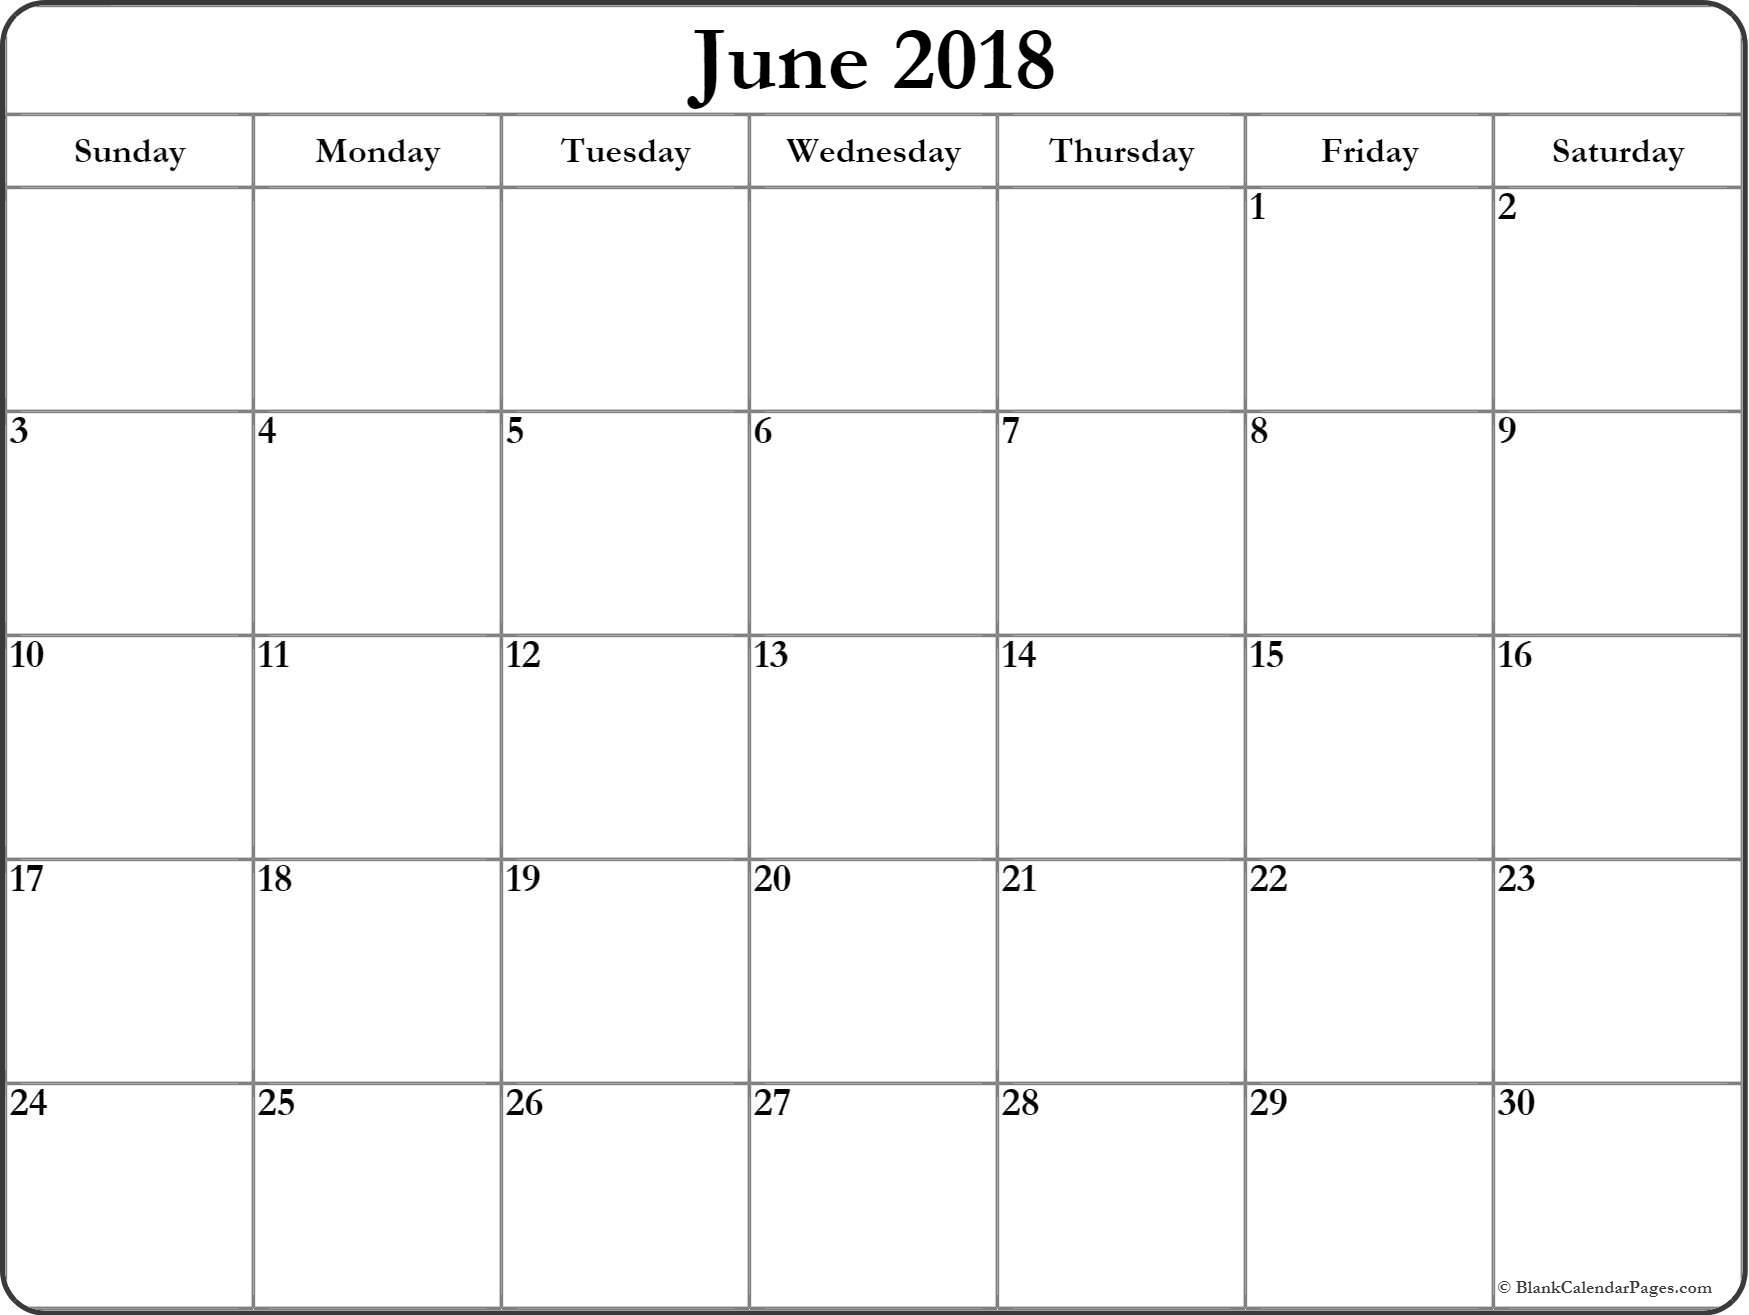 Blank June 2018 Printable Calendar